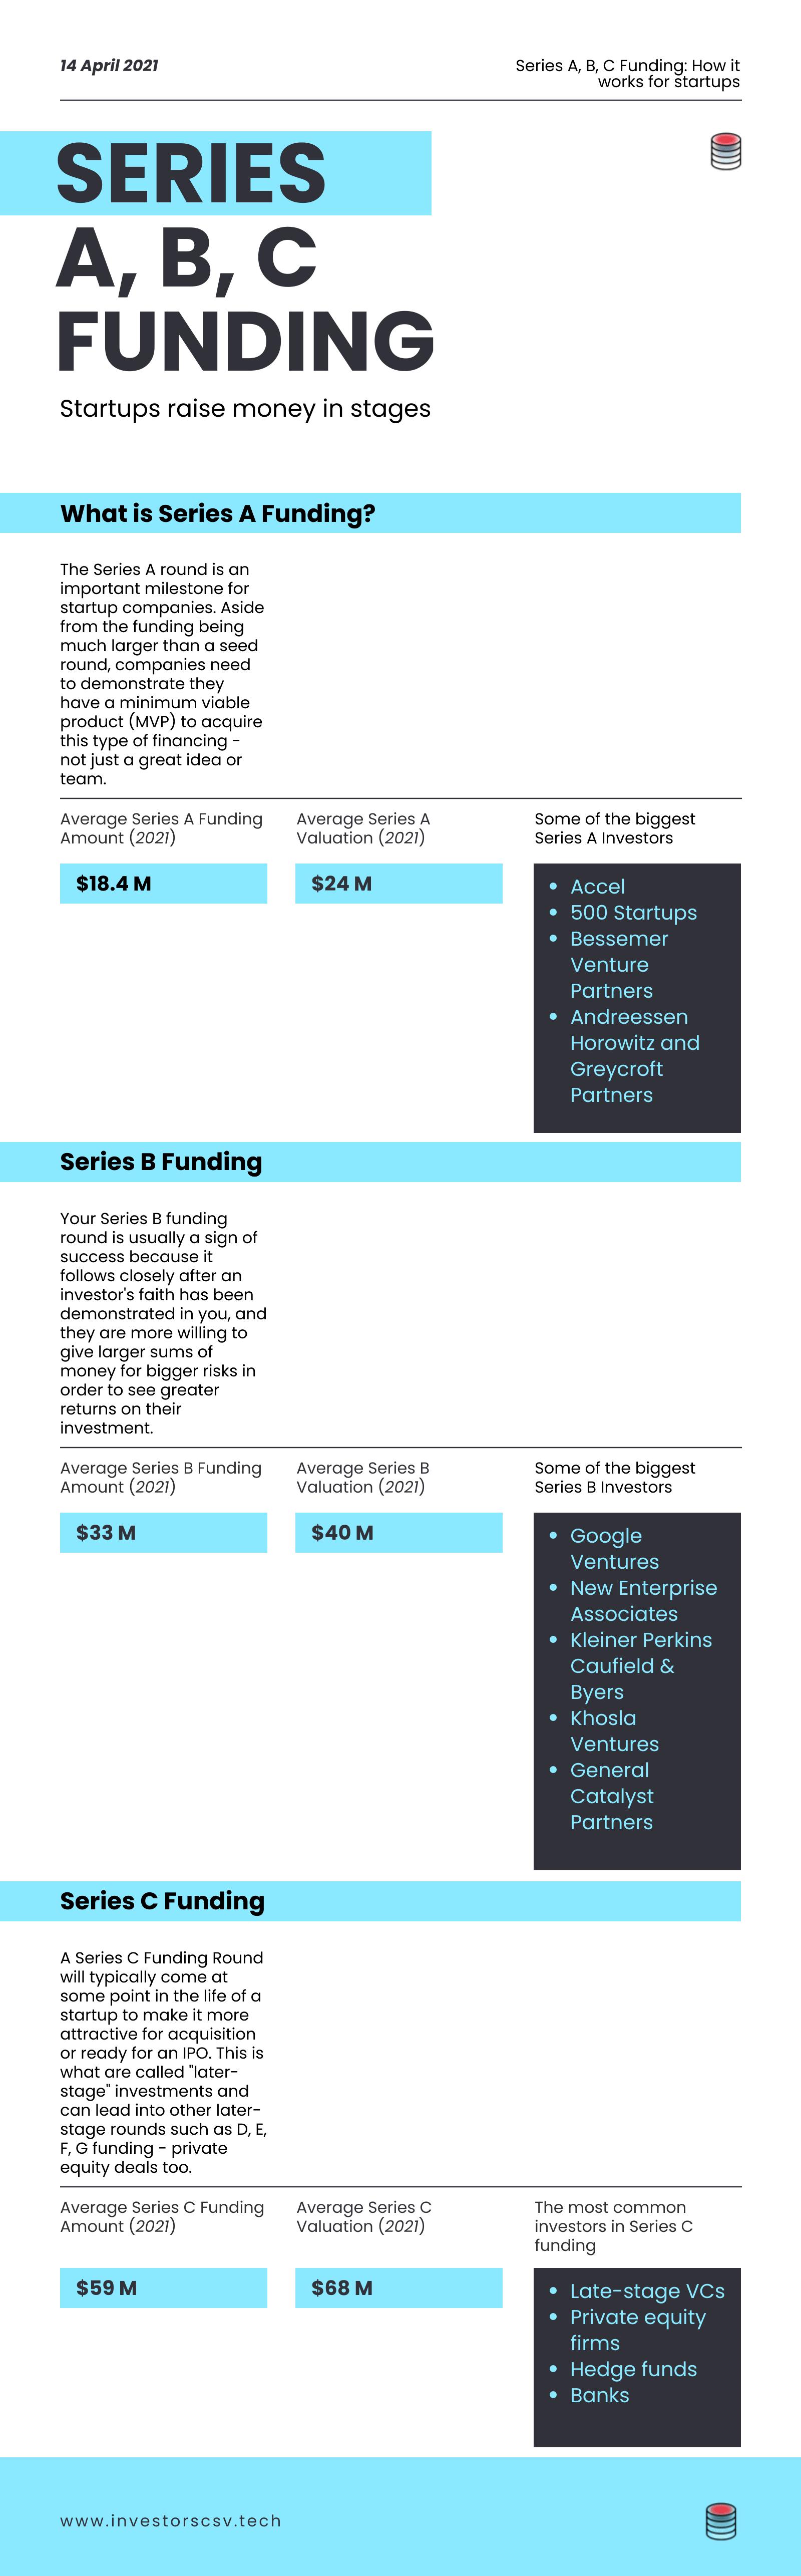 infographic series funding